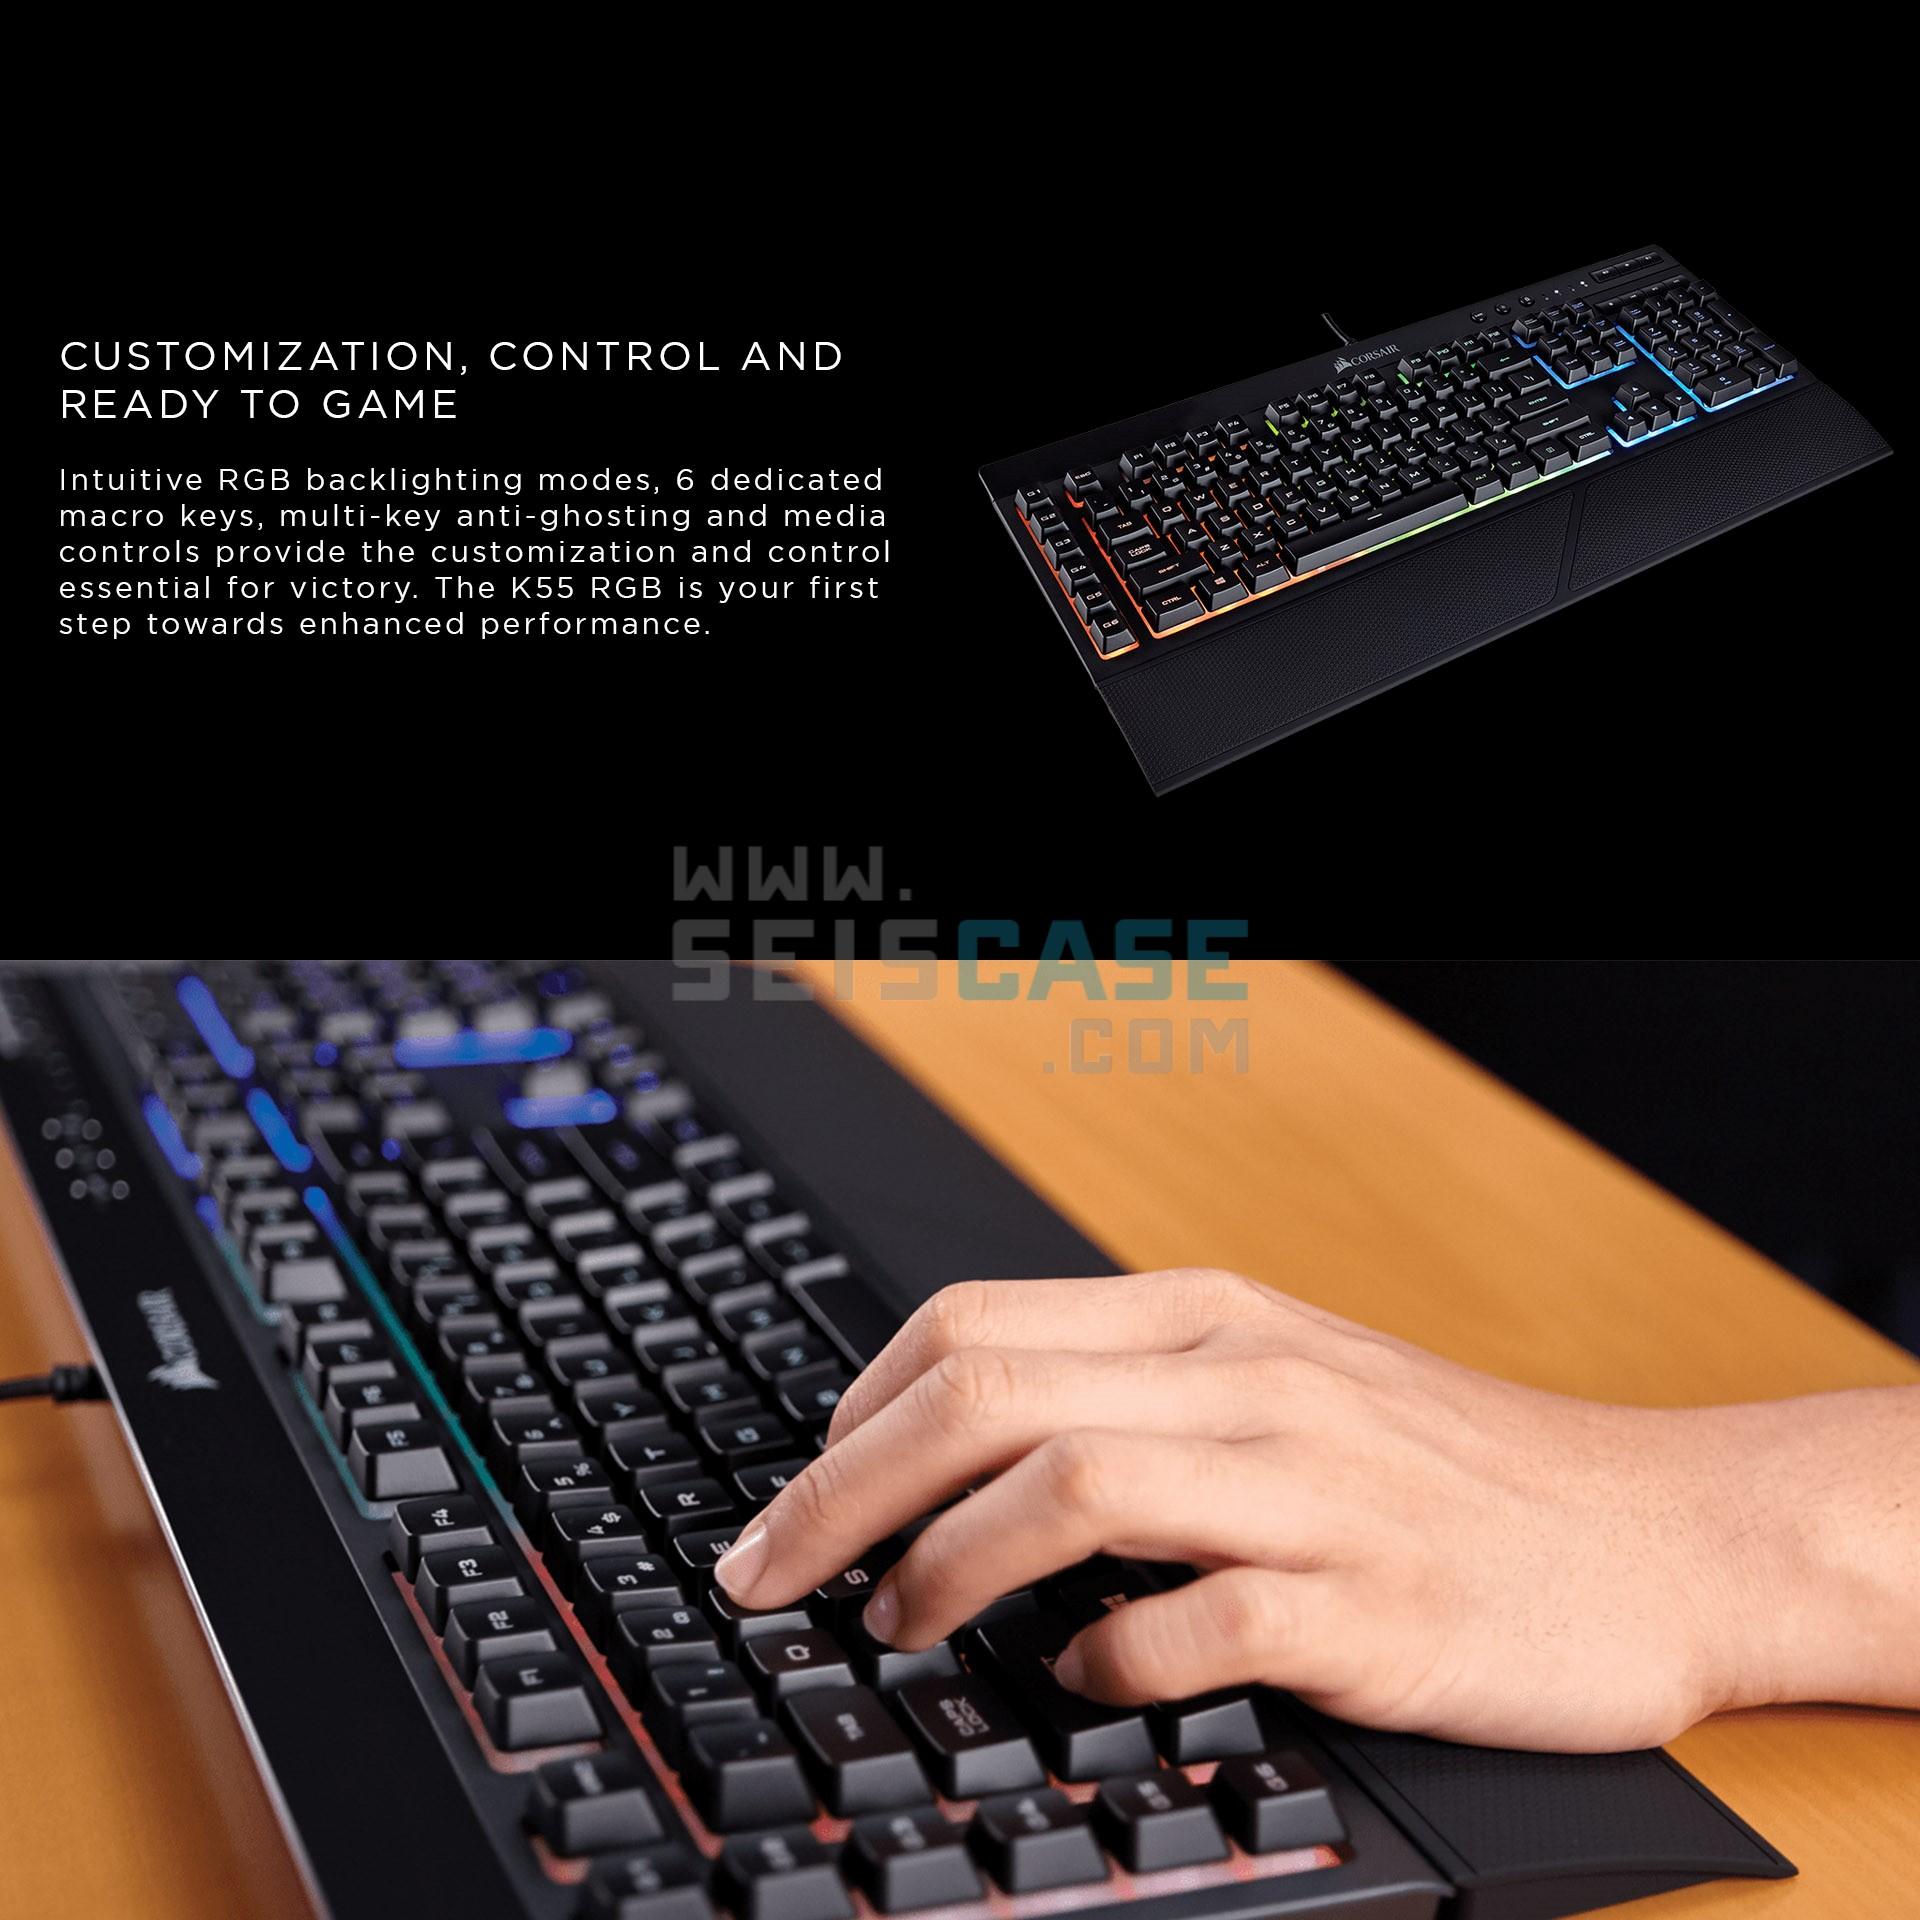 CORSAIR K55 RGB Gaming Keyboard 6 Macros Key Volume Multimedia Control